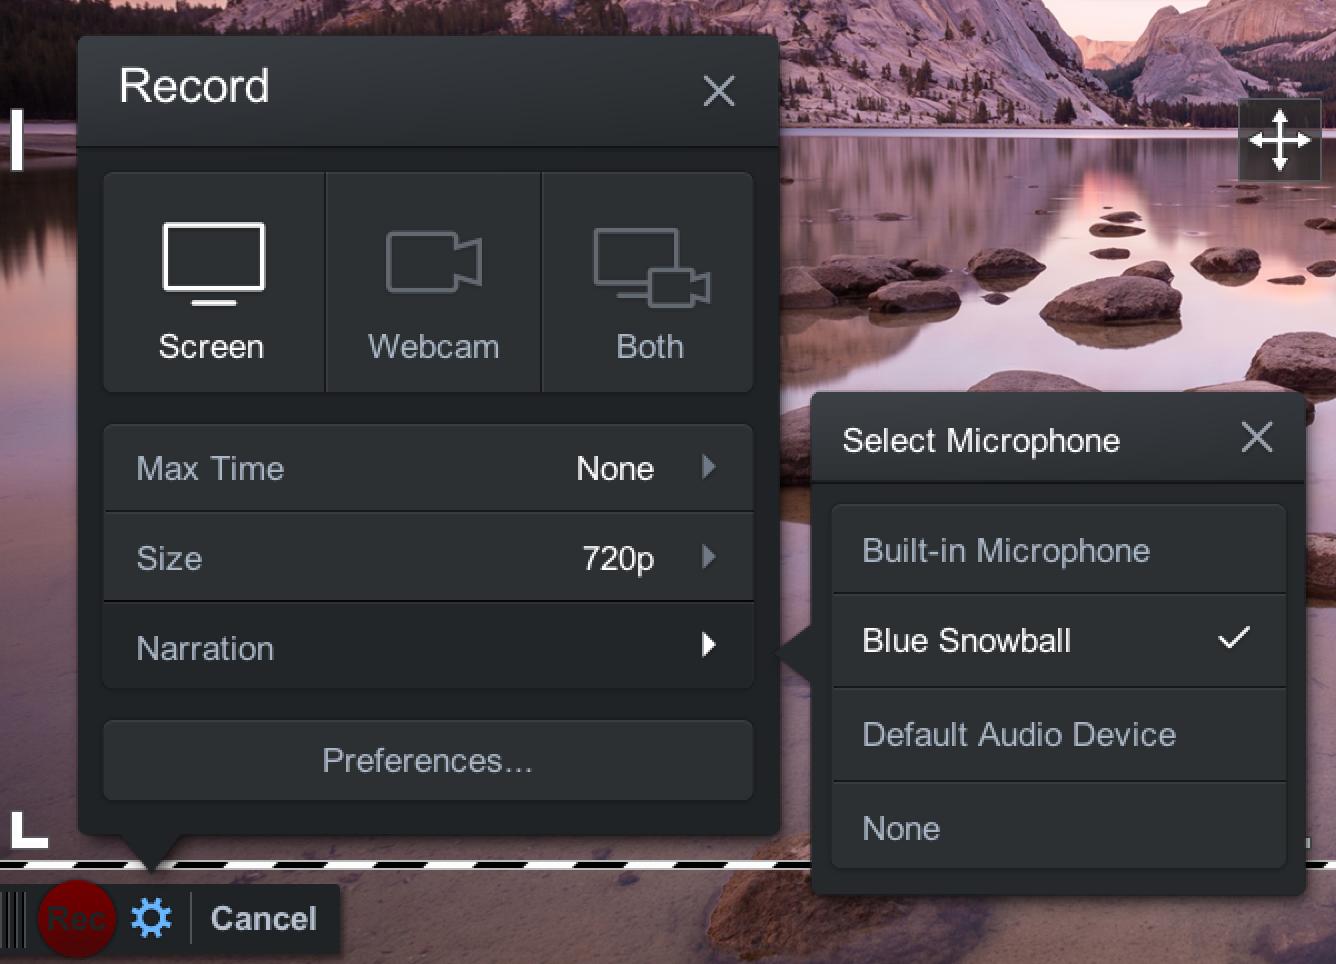 Screencast audio options